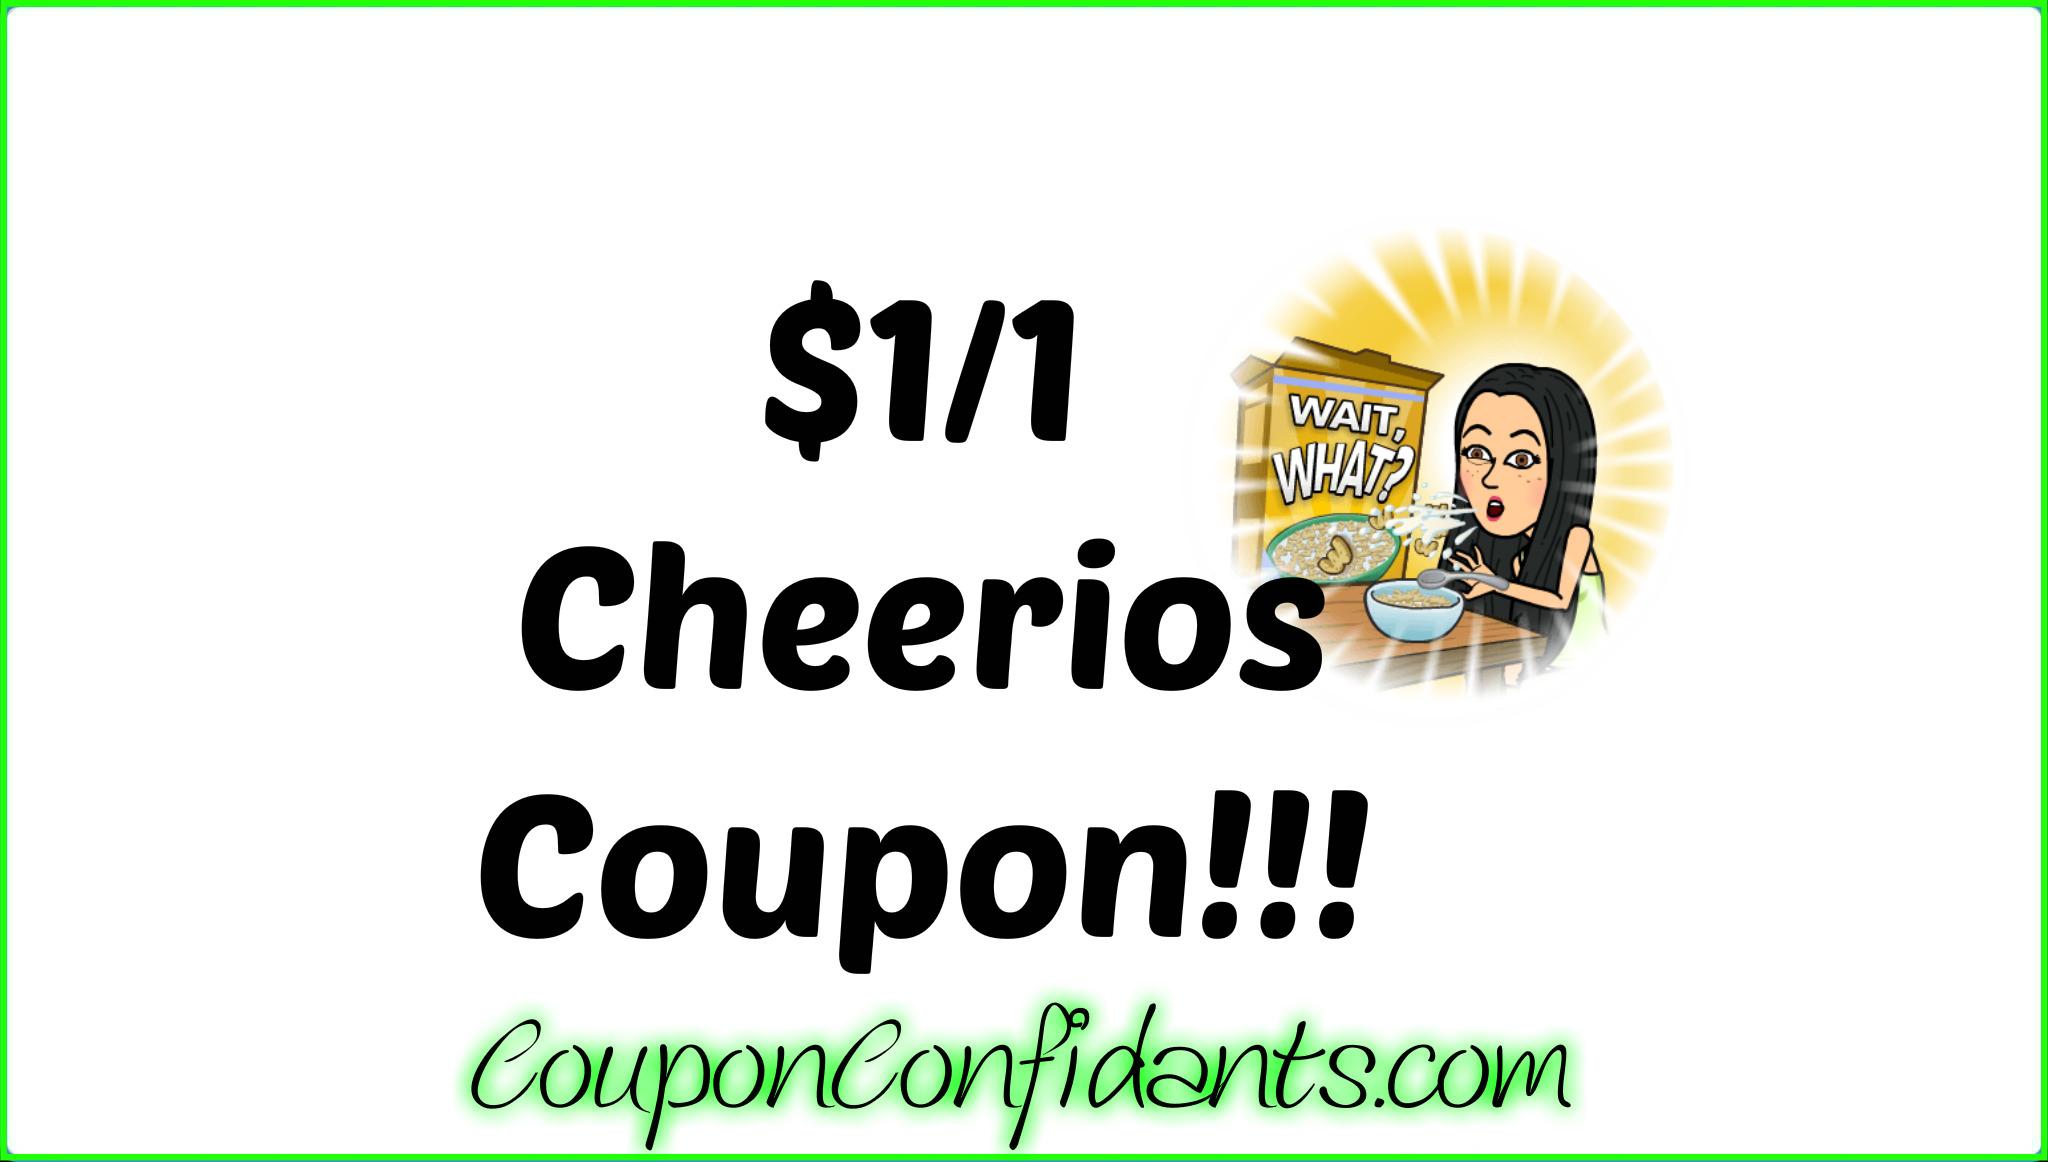 Cheerios coupons october 2018